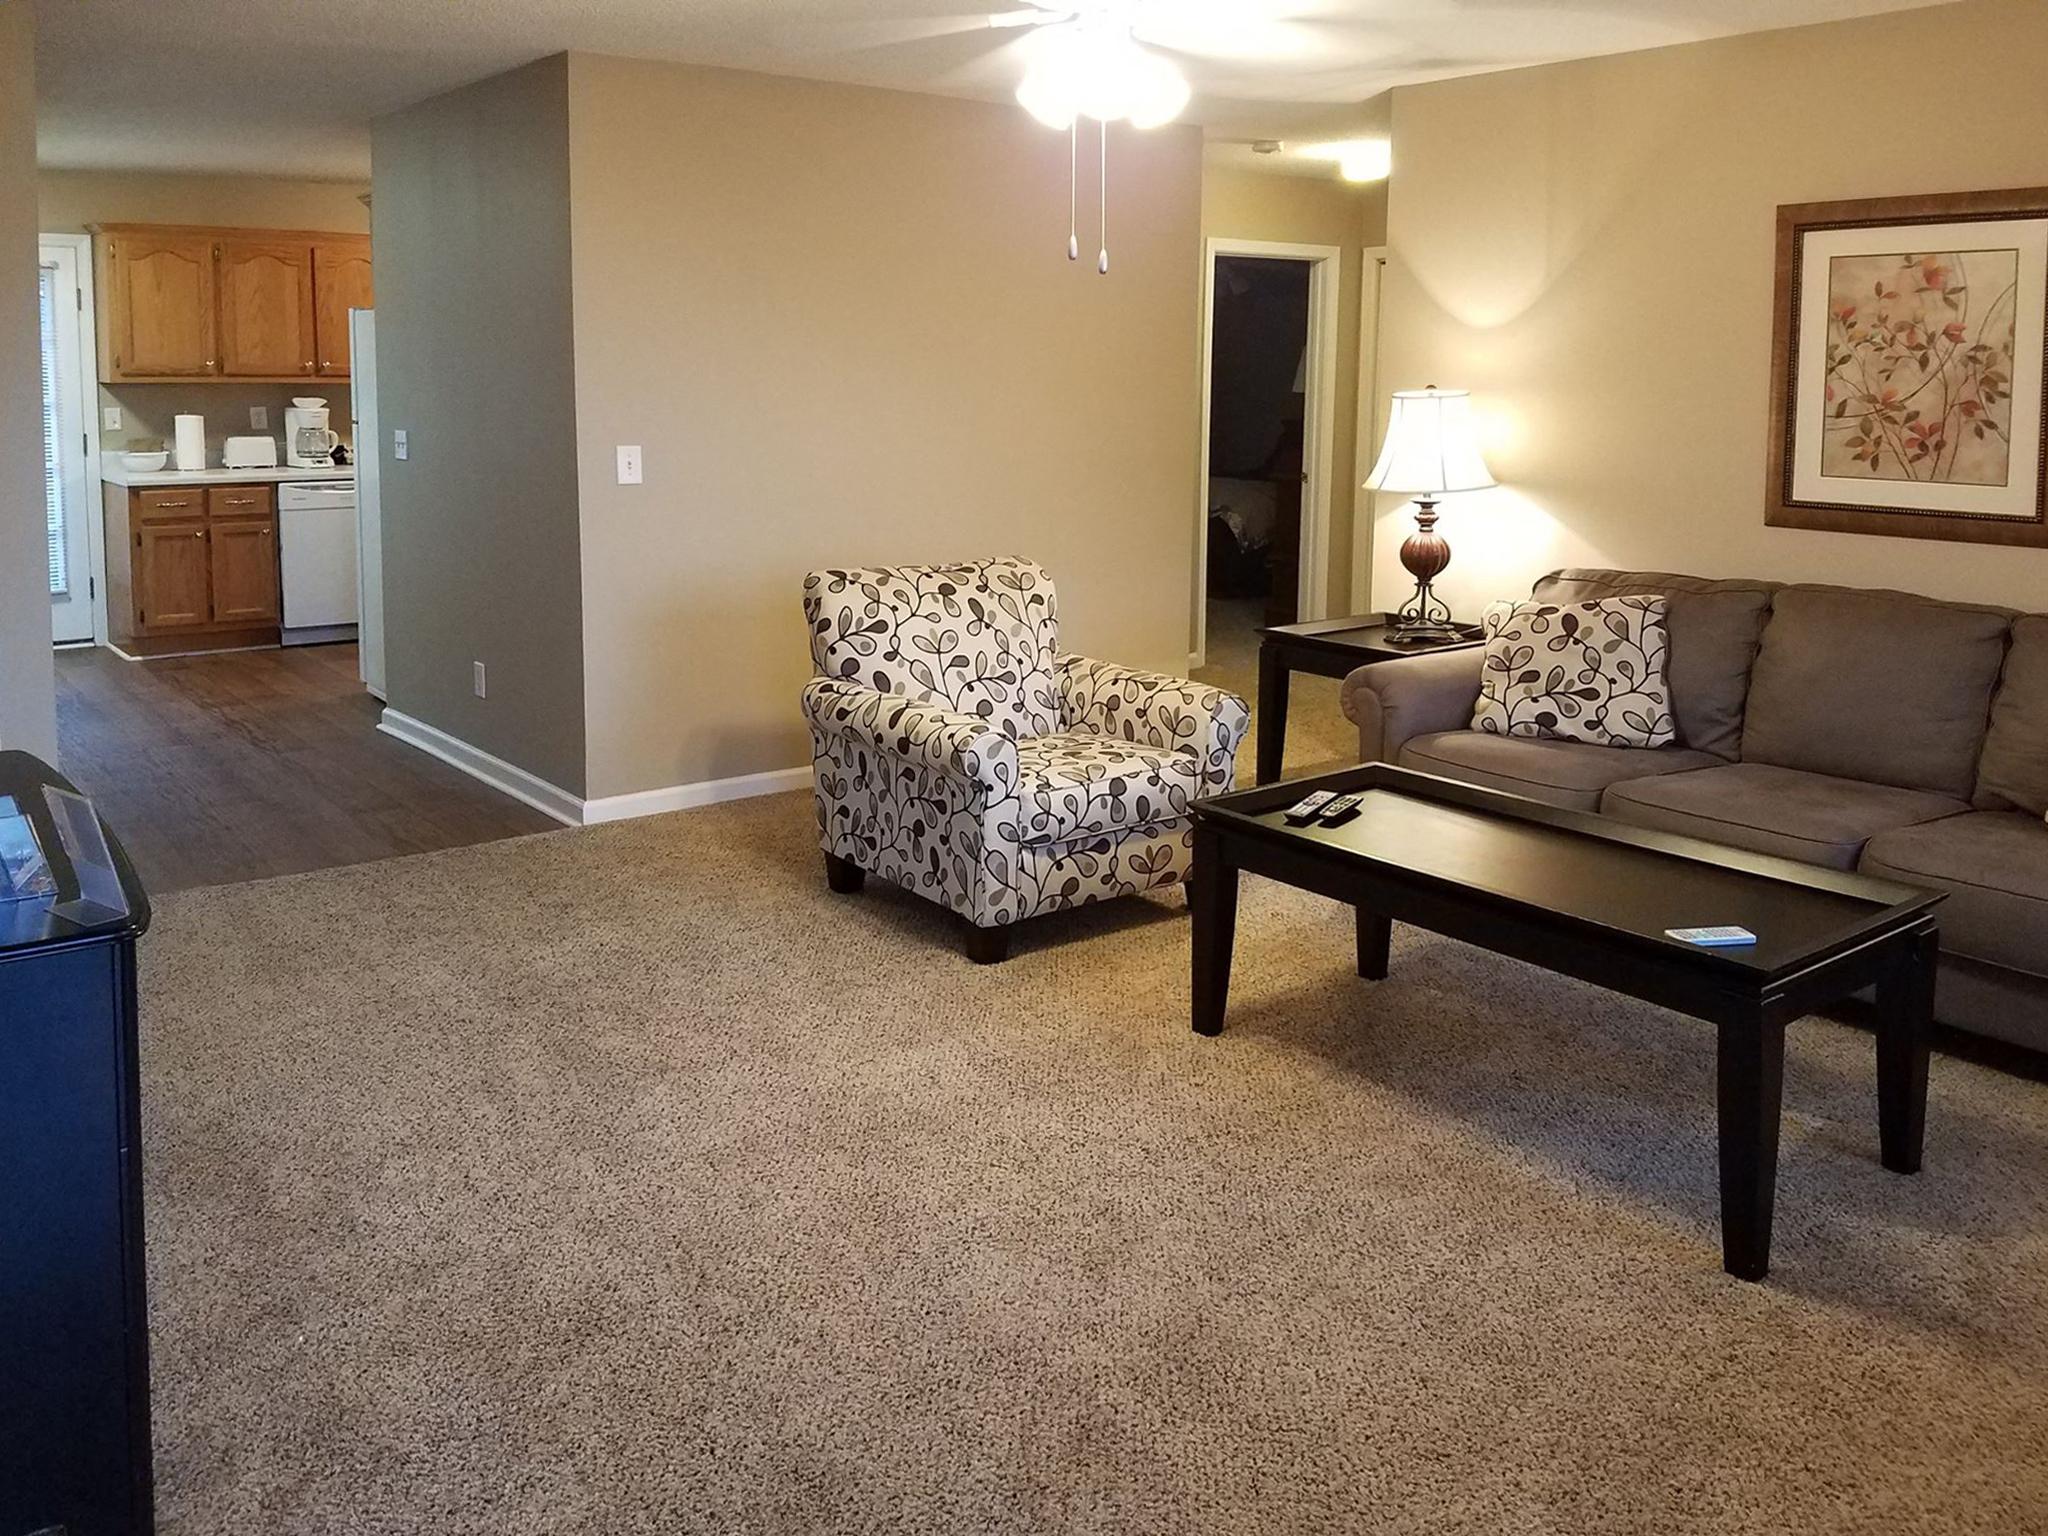 Mountain View Apartments Oxford AL Anniston, AL 36207 living room